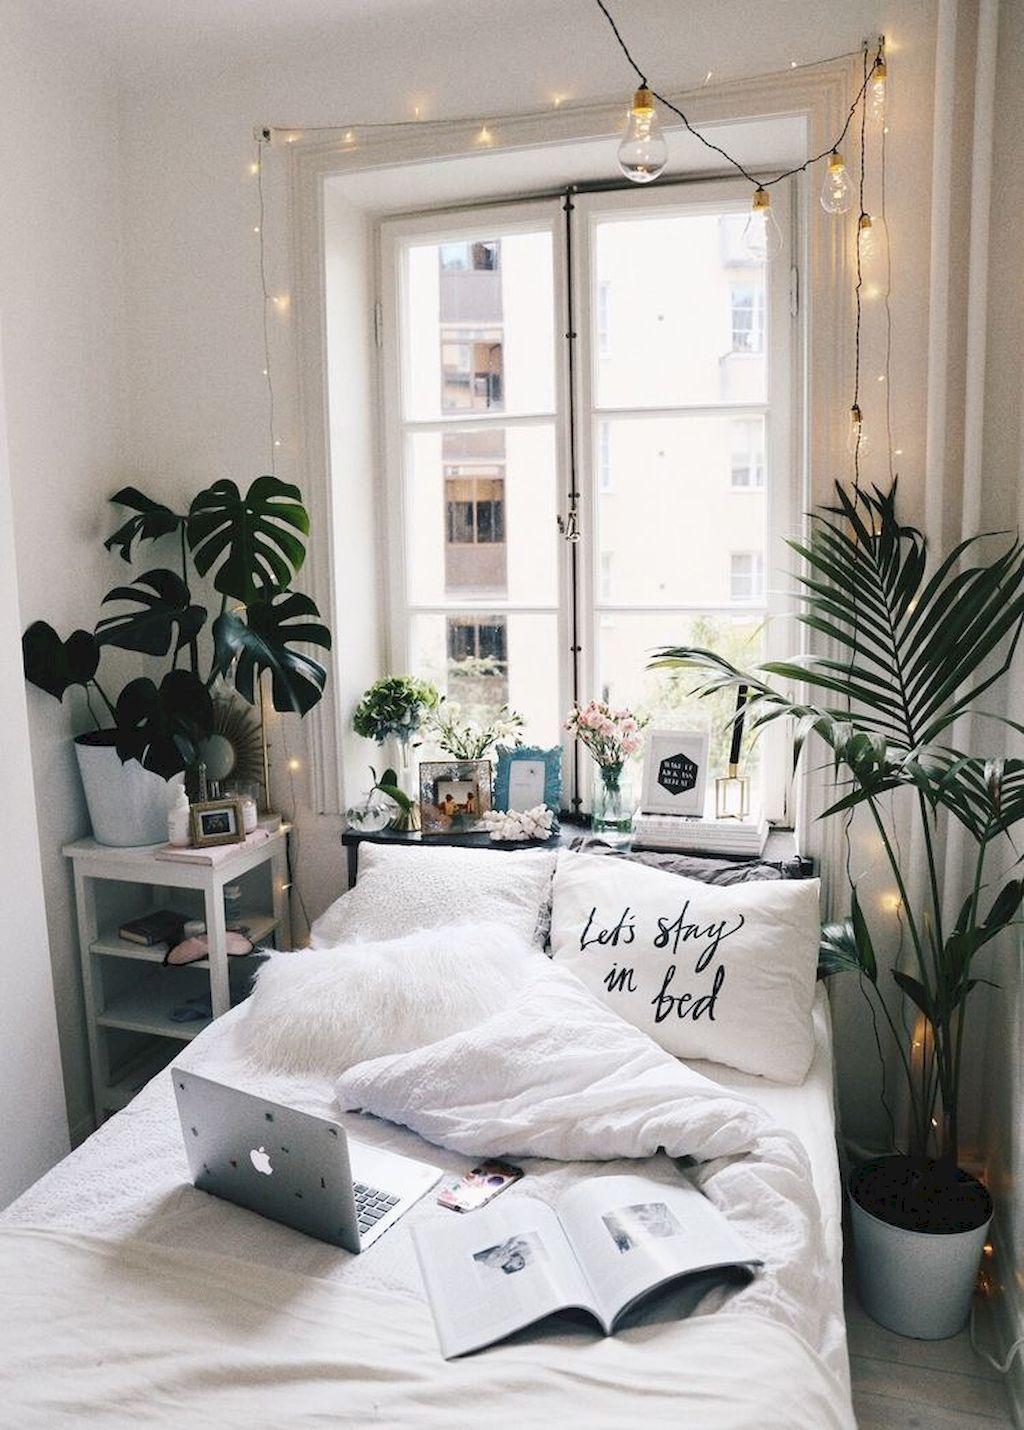 80 Cute DIY Dorm Room Decorating Ideas on a Budget | Dorm ...